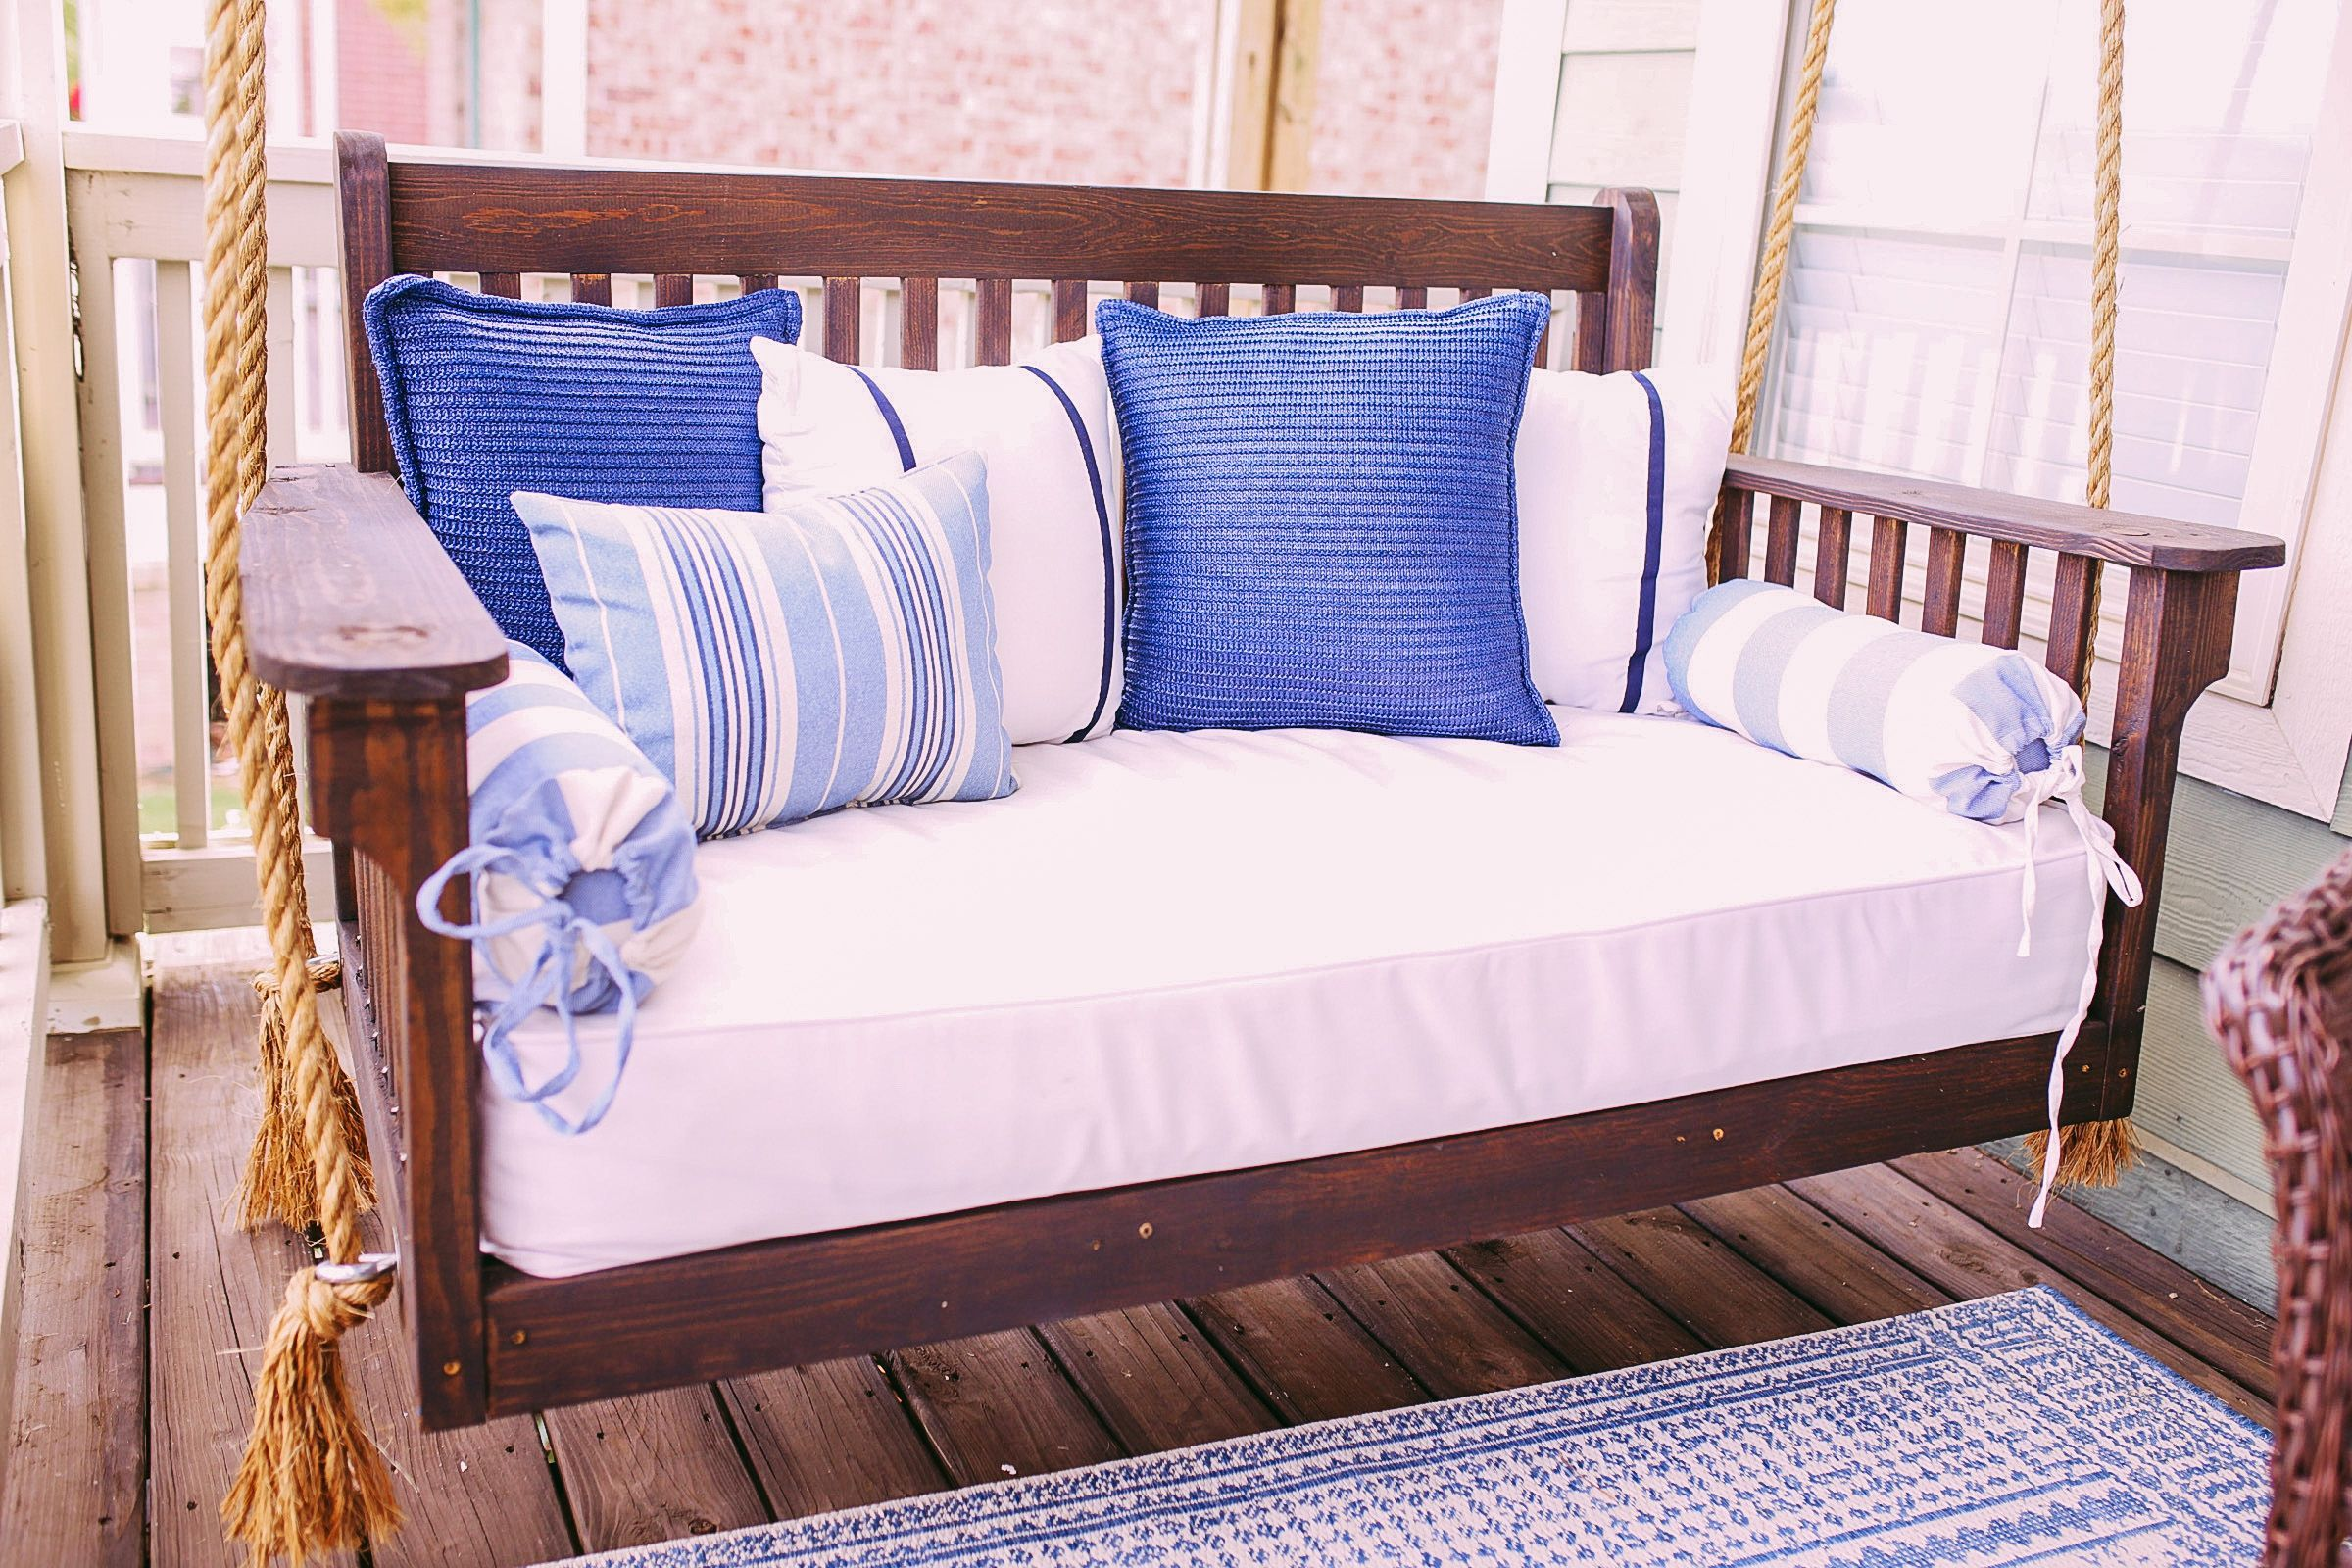 Diy Crib Mattress Front Porch Swing For Under 150 Thrifty Pineapple In 2020 Diy Crib Mattress Porch Swing Diy Crib